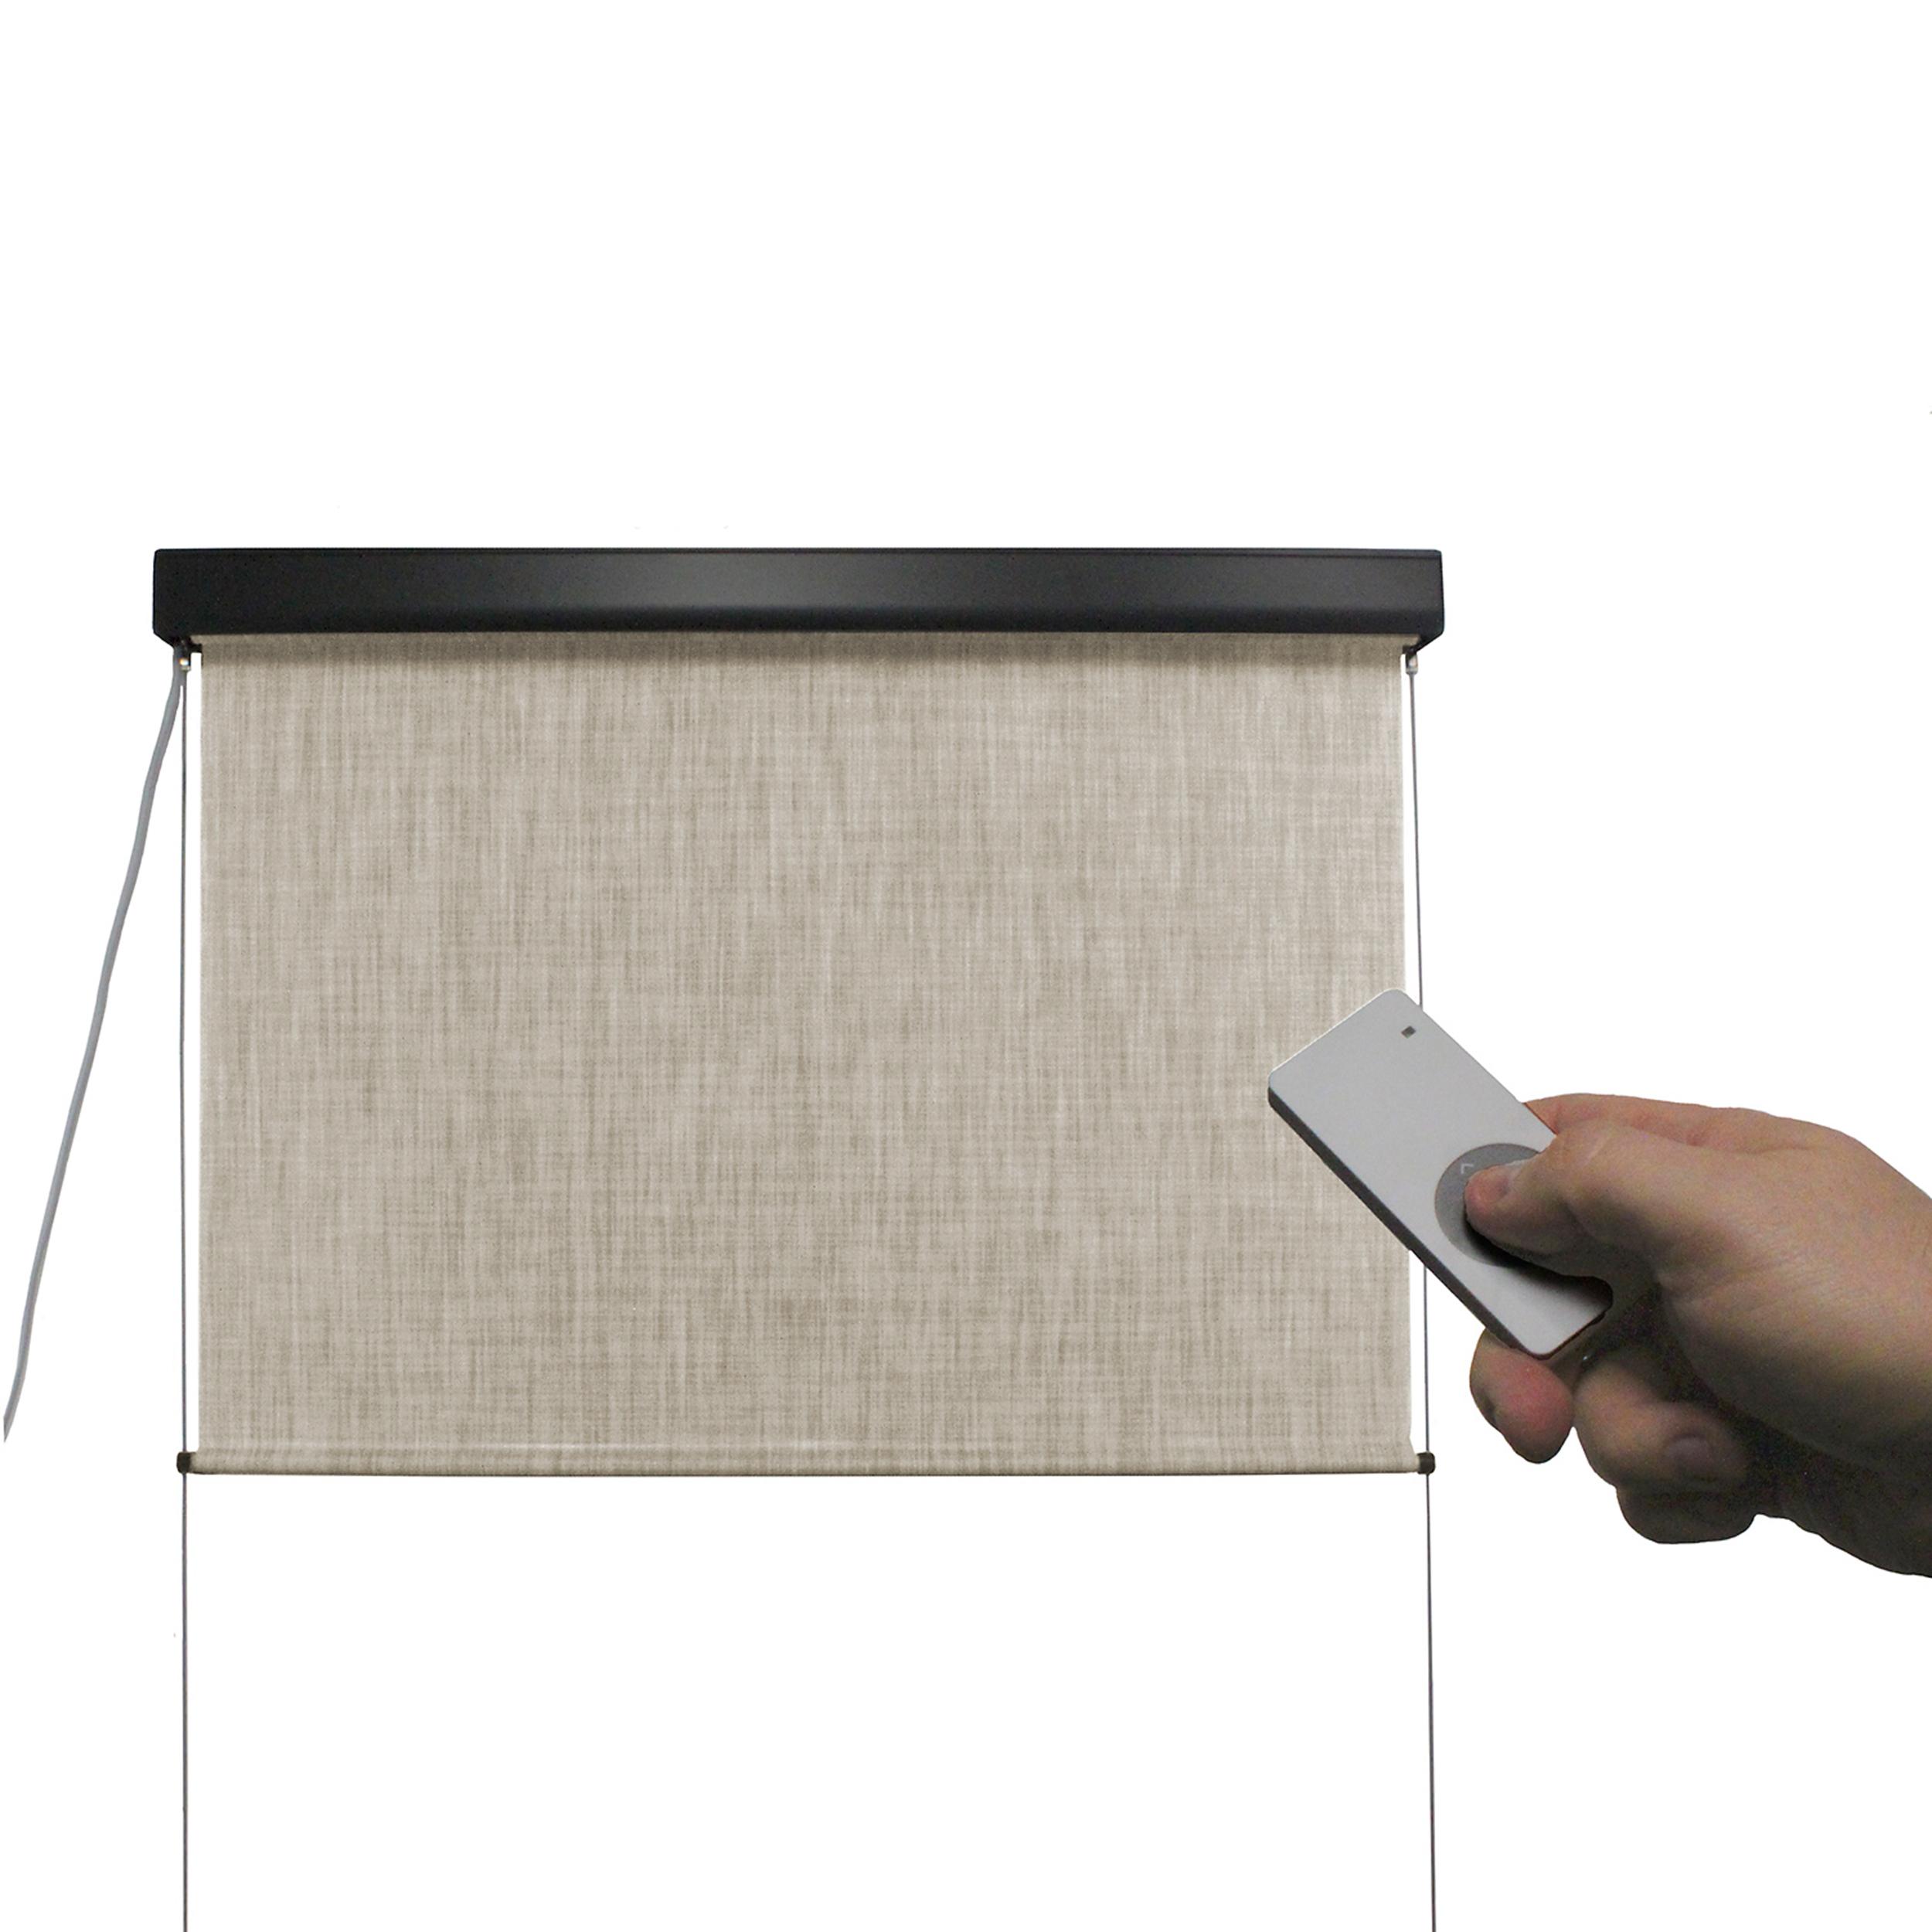 Valanced Sunshade, Elite Plus, Remote Control, 8' W x 8' Drop, Caribbean Fabric